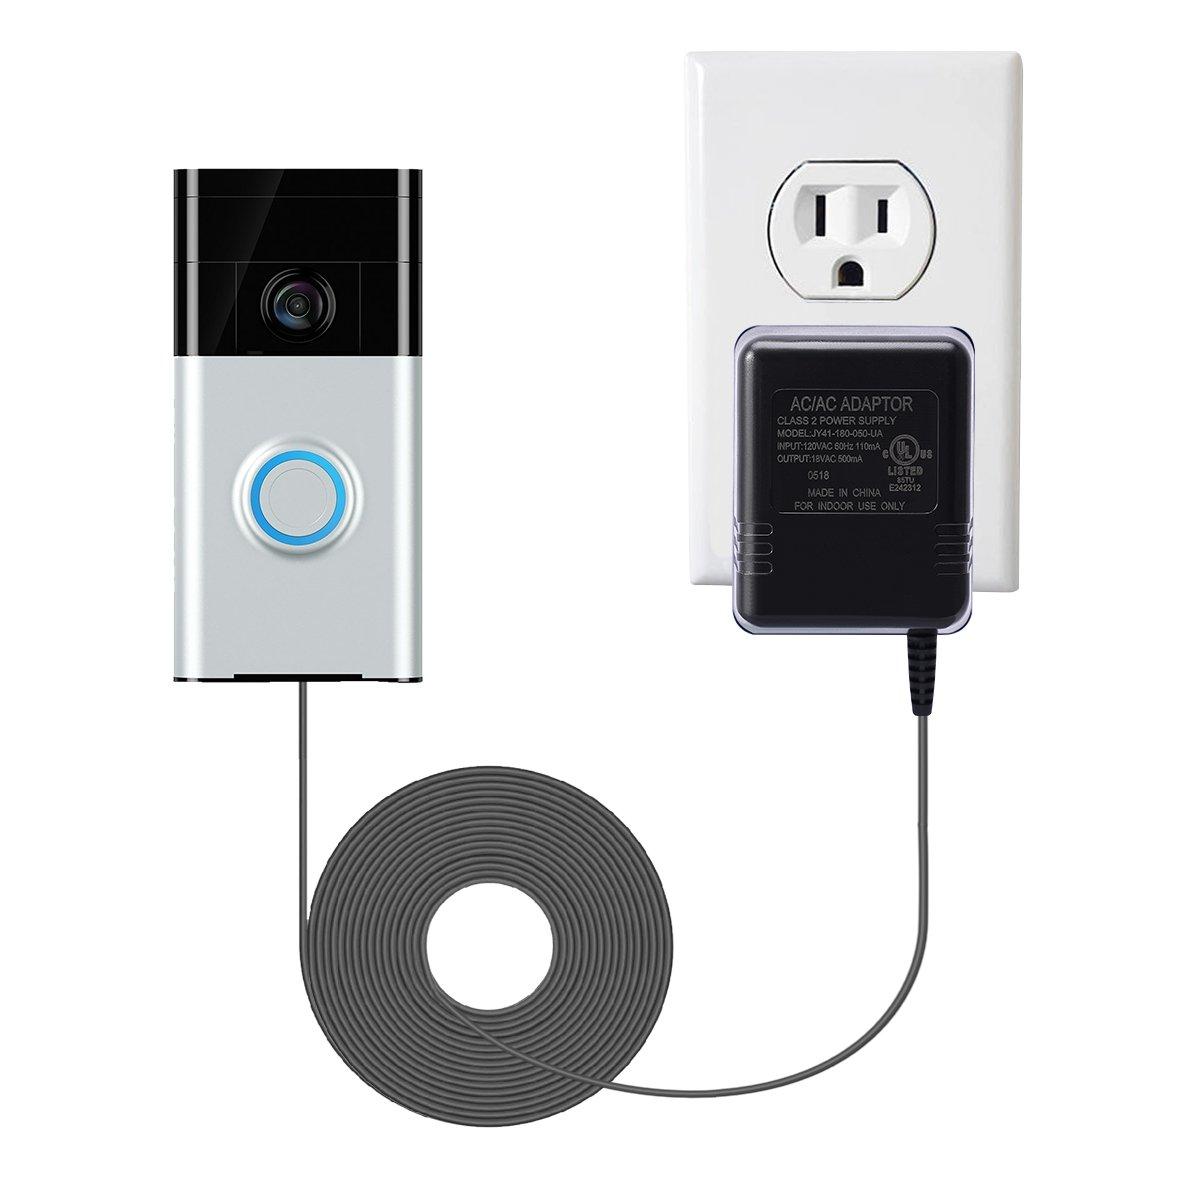 LANMU Power Adapter for Ring Video Doorbell,Power Supply for Ring Video Doorbell Pro,Ring Video Doorbell Pro 2,Nest Hello Video Doorbell and Zmodo Smart Greet Wi-Fi Video Doorbell